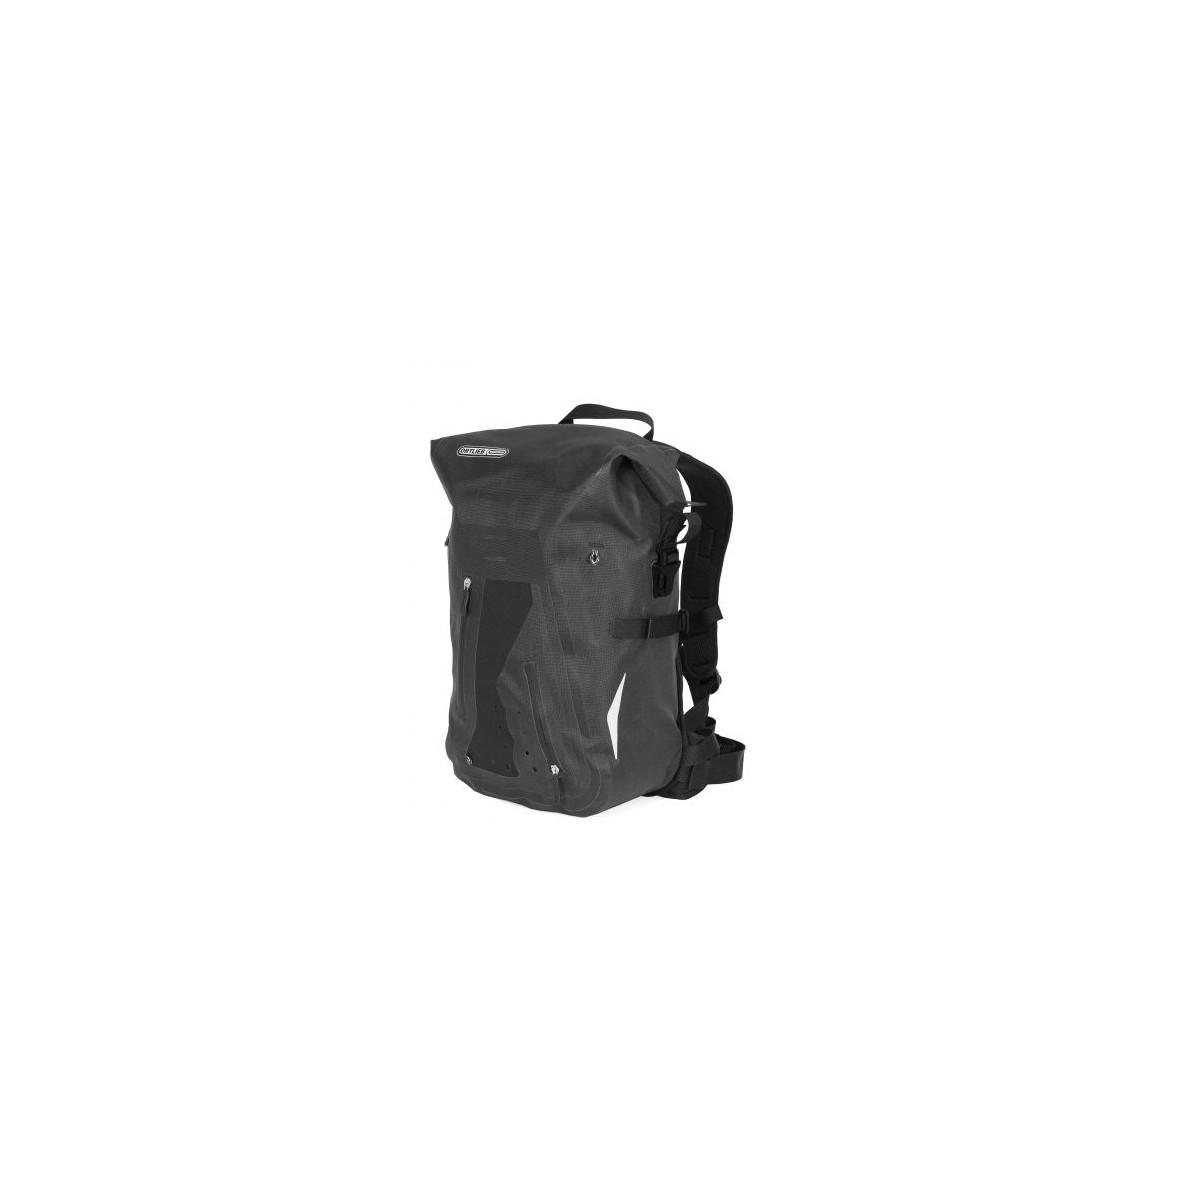 Mugursomas Ortlieb Packman Pro 2  20L